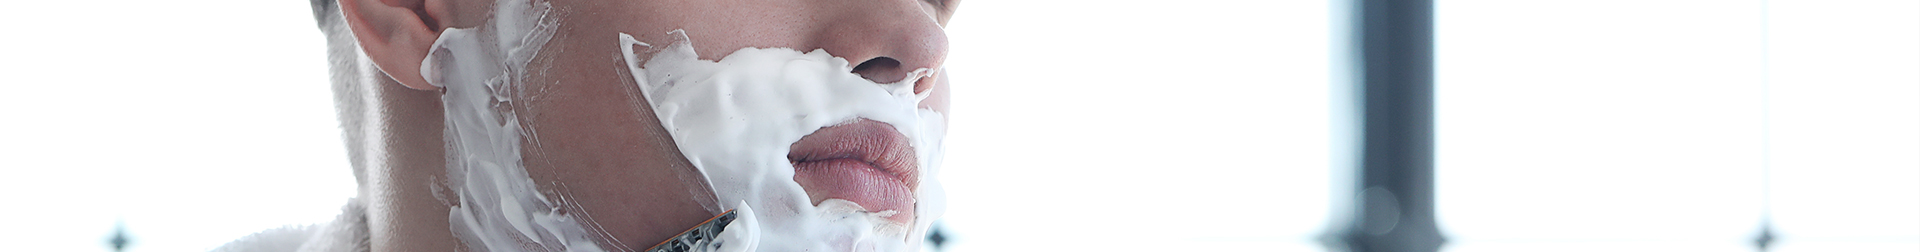 Shaving Cream   Buy Shaving Cream - Shaving Foams, Shaving Gels    Aromacraze.com